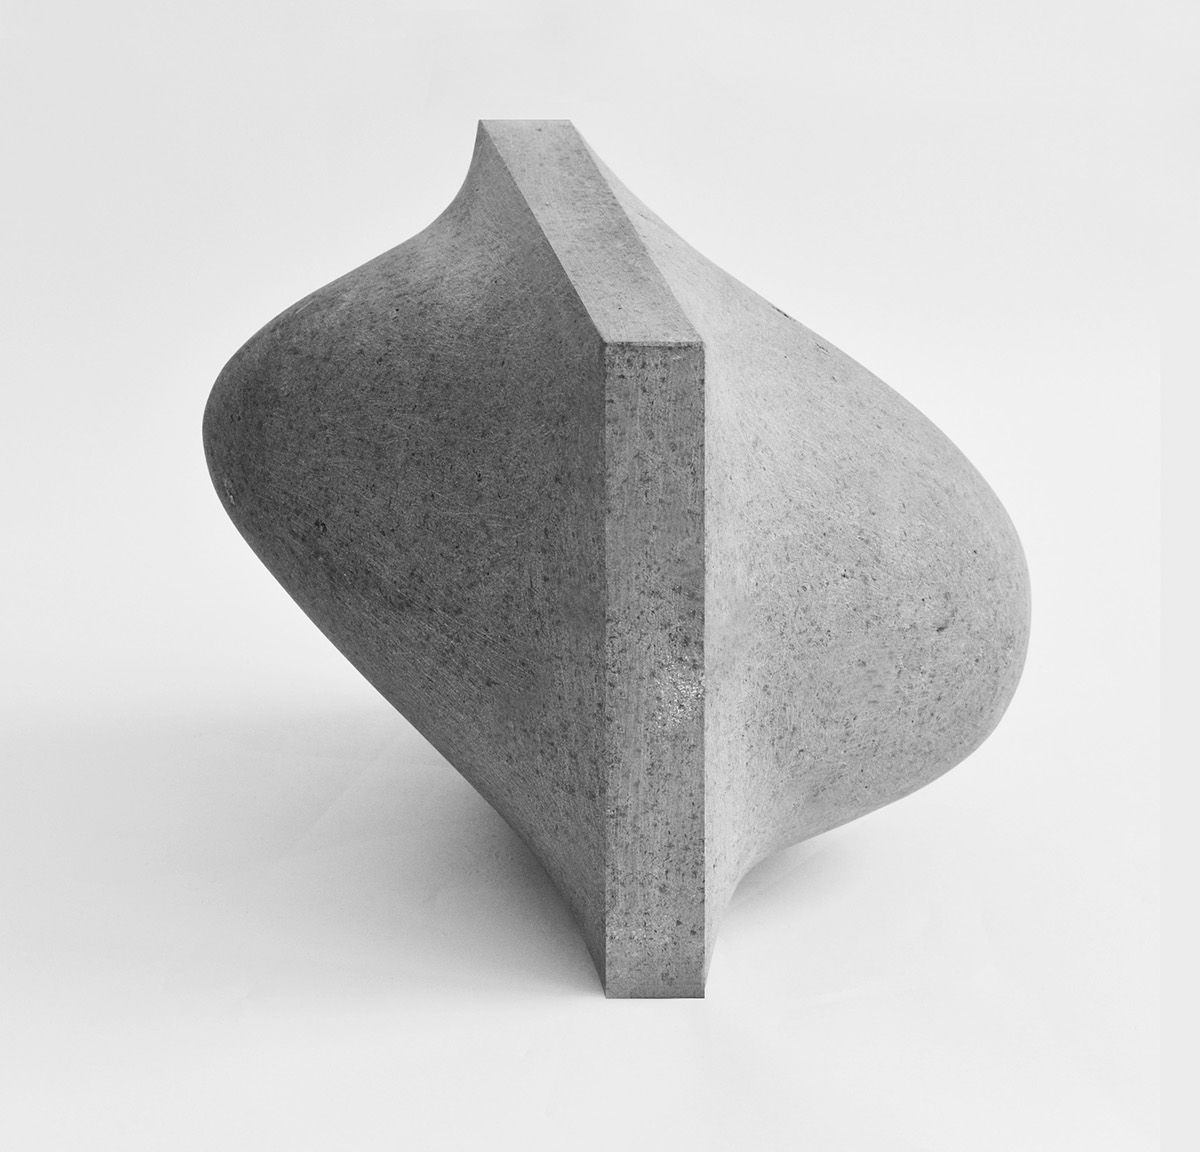 hidden form / сакривена форма on Behance